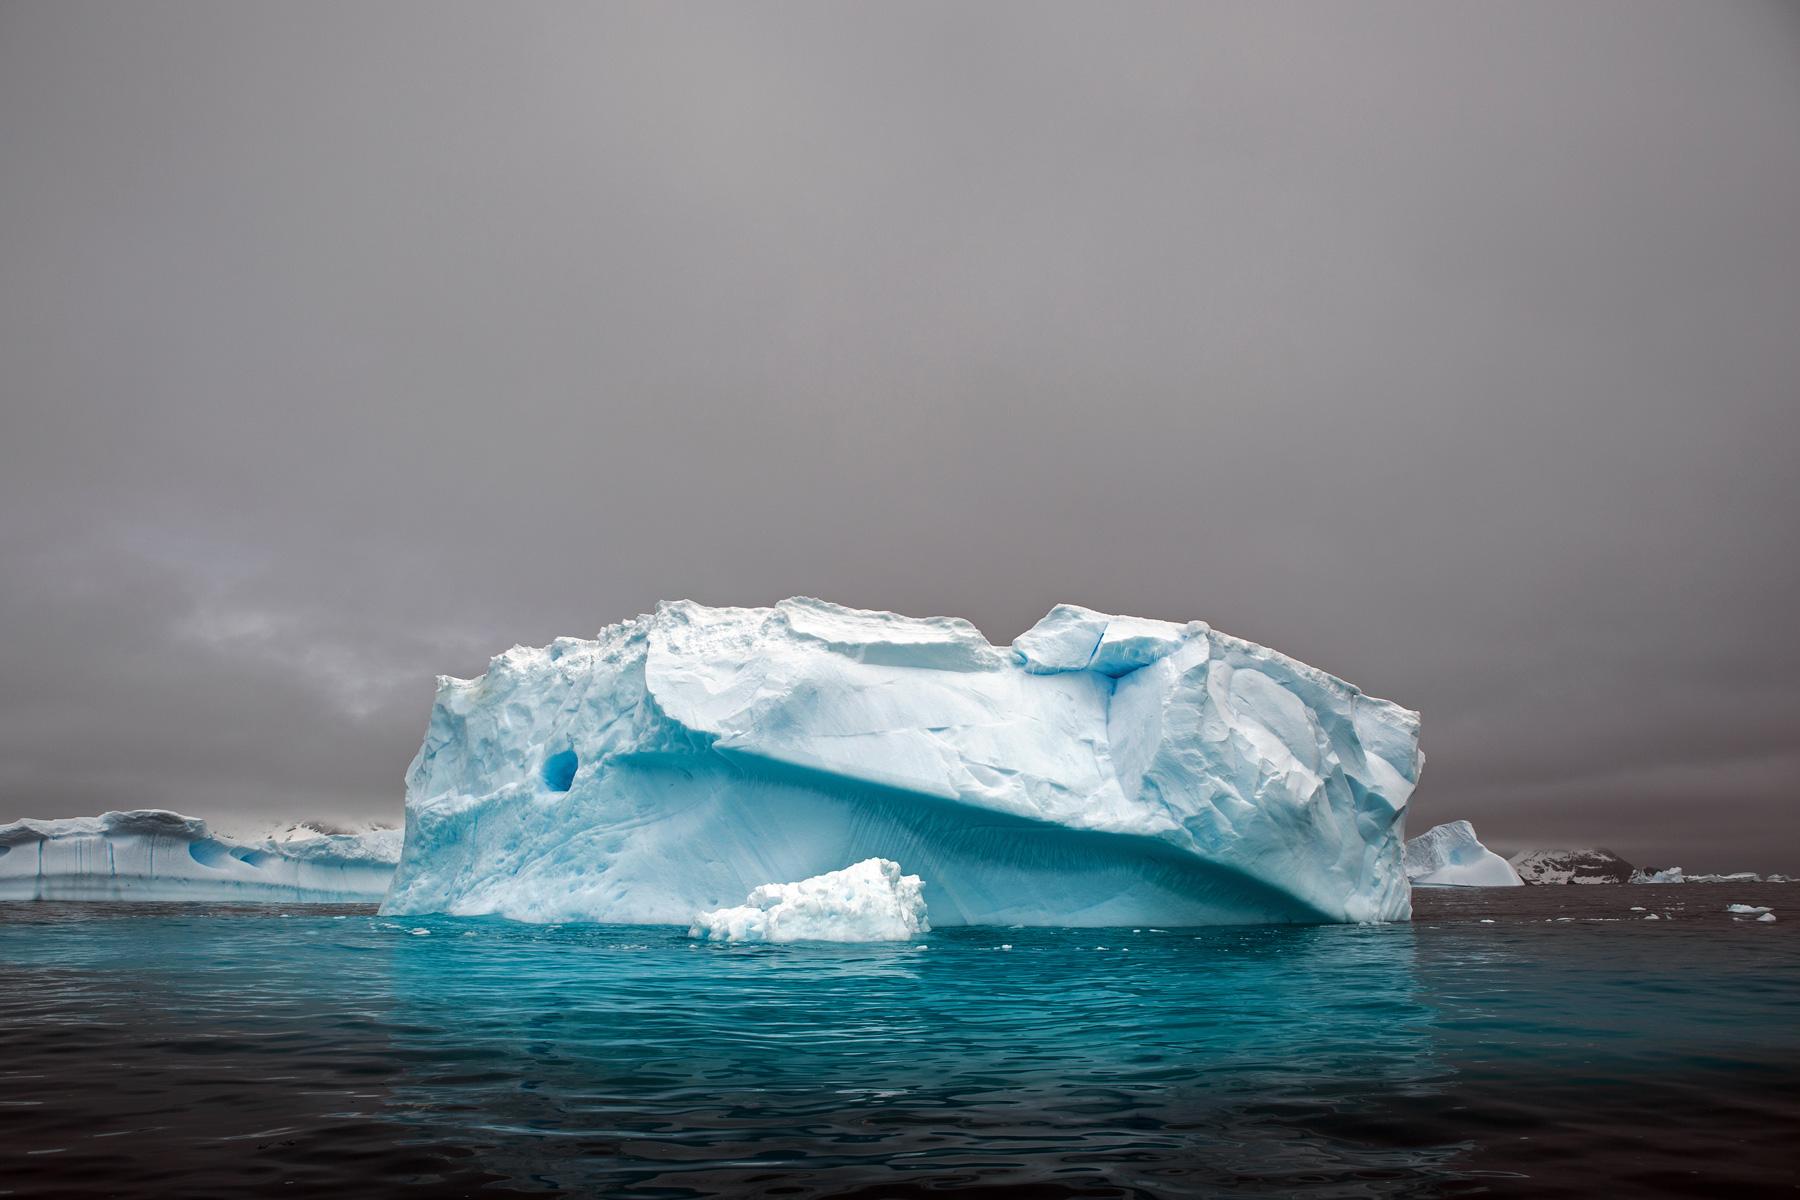 An iceberg in Cierva Cove, Antarctica